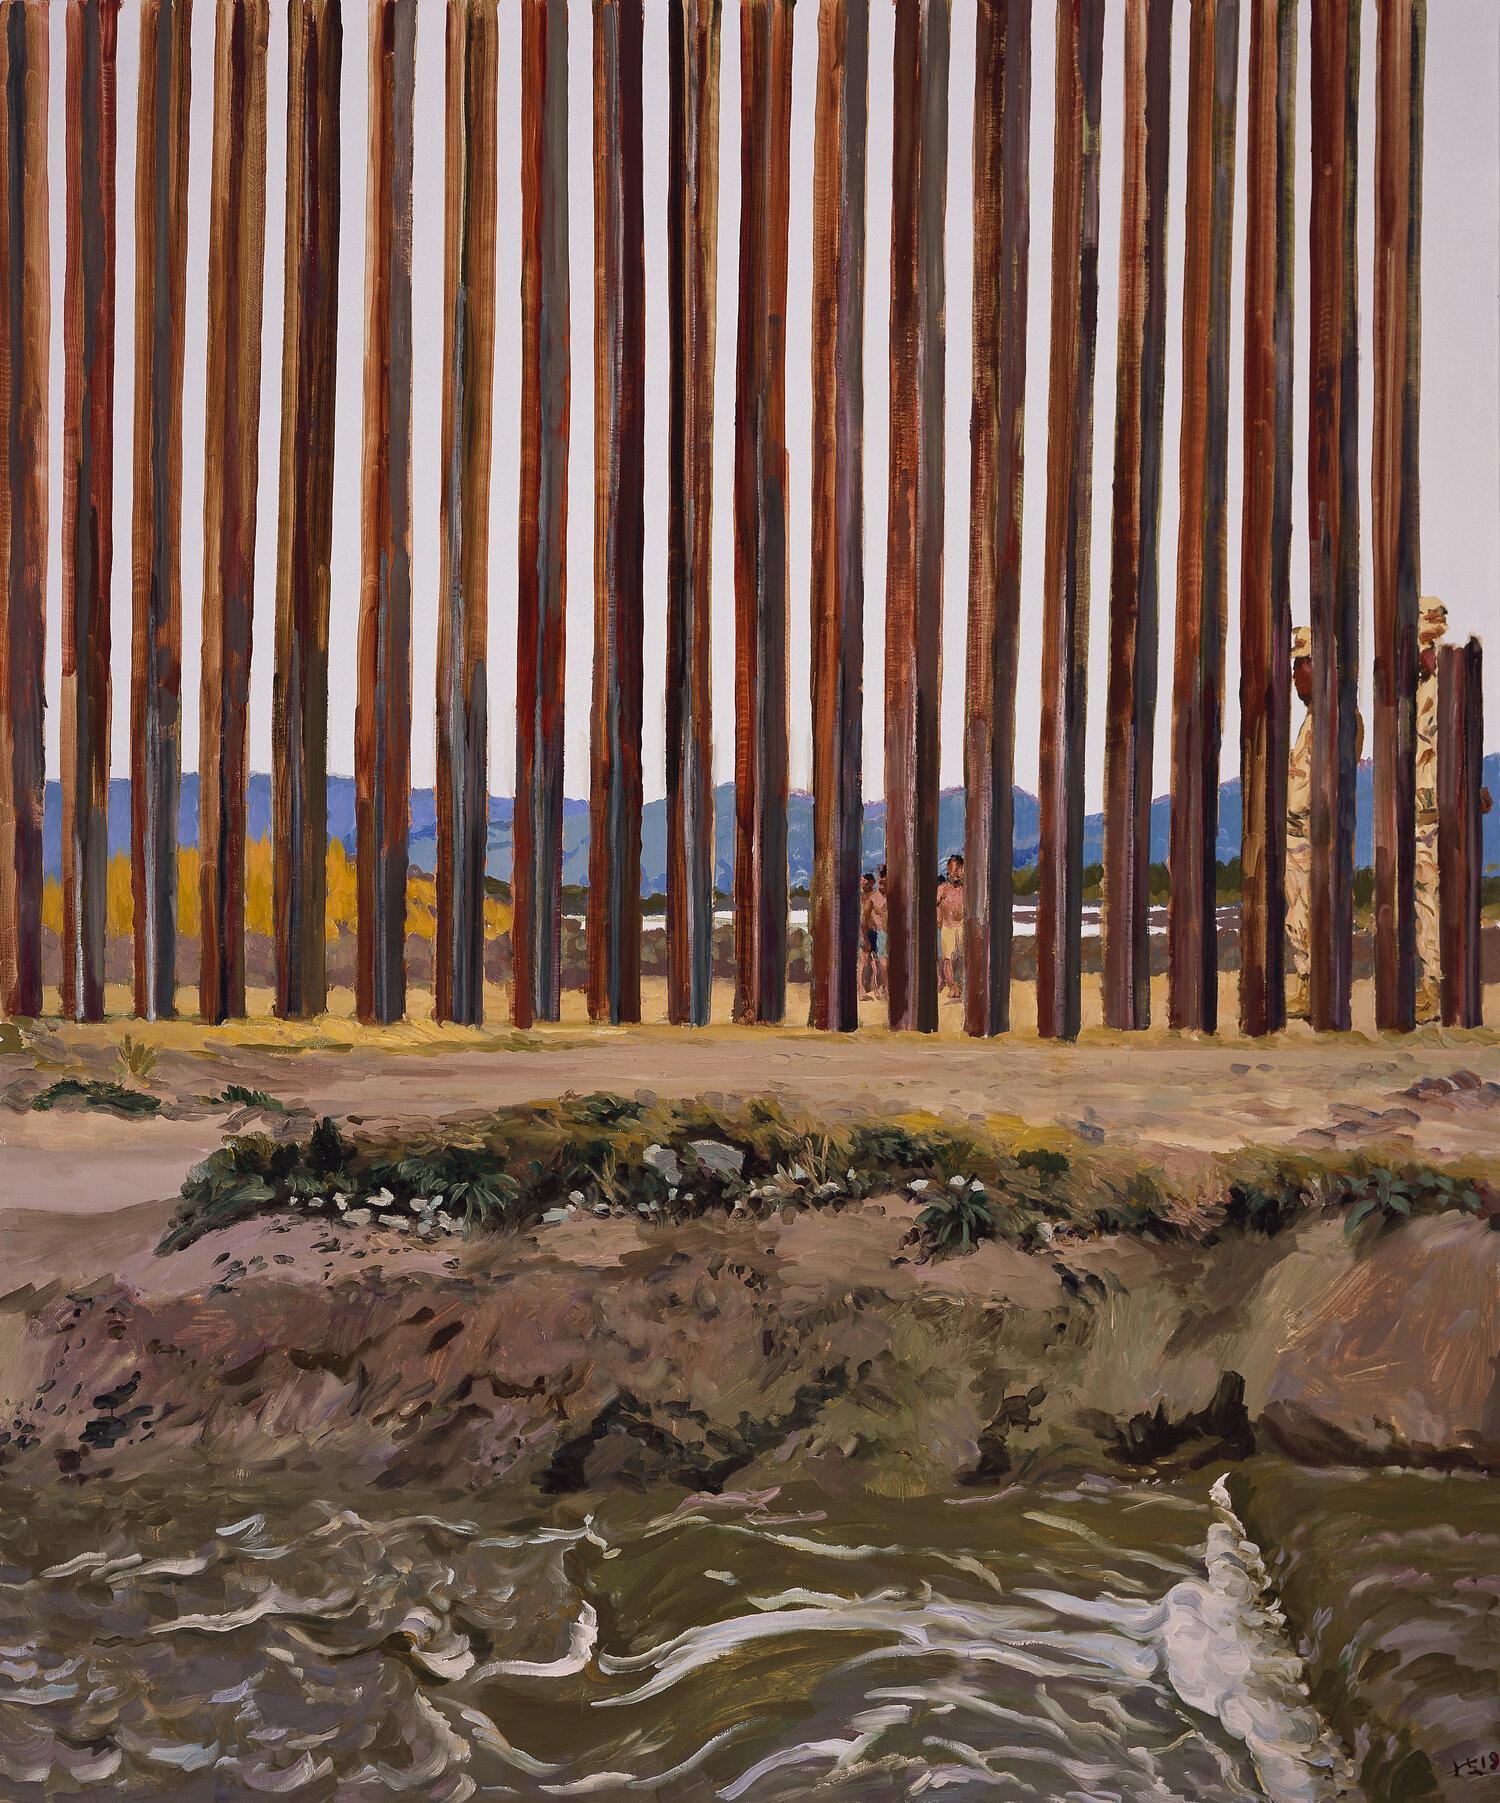 L'artiste chinois Liu Xiaodong au Dallas Contemporary Usa